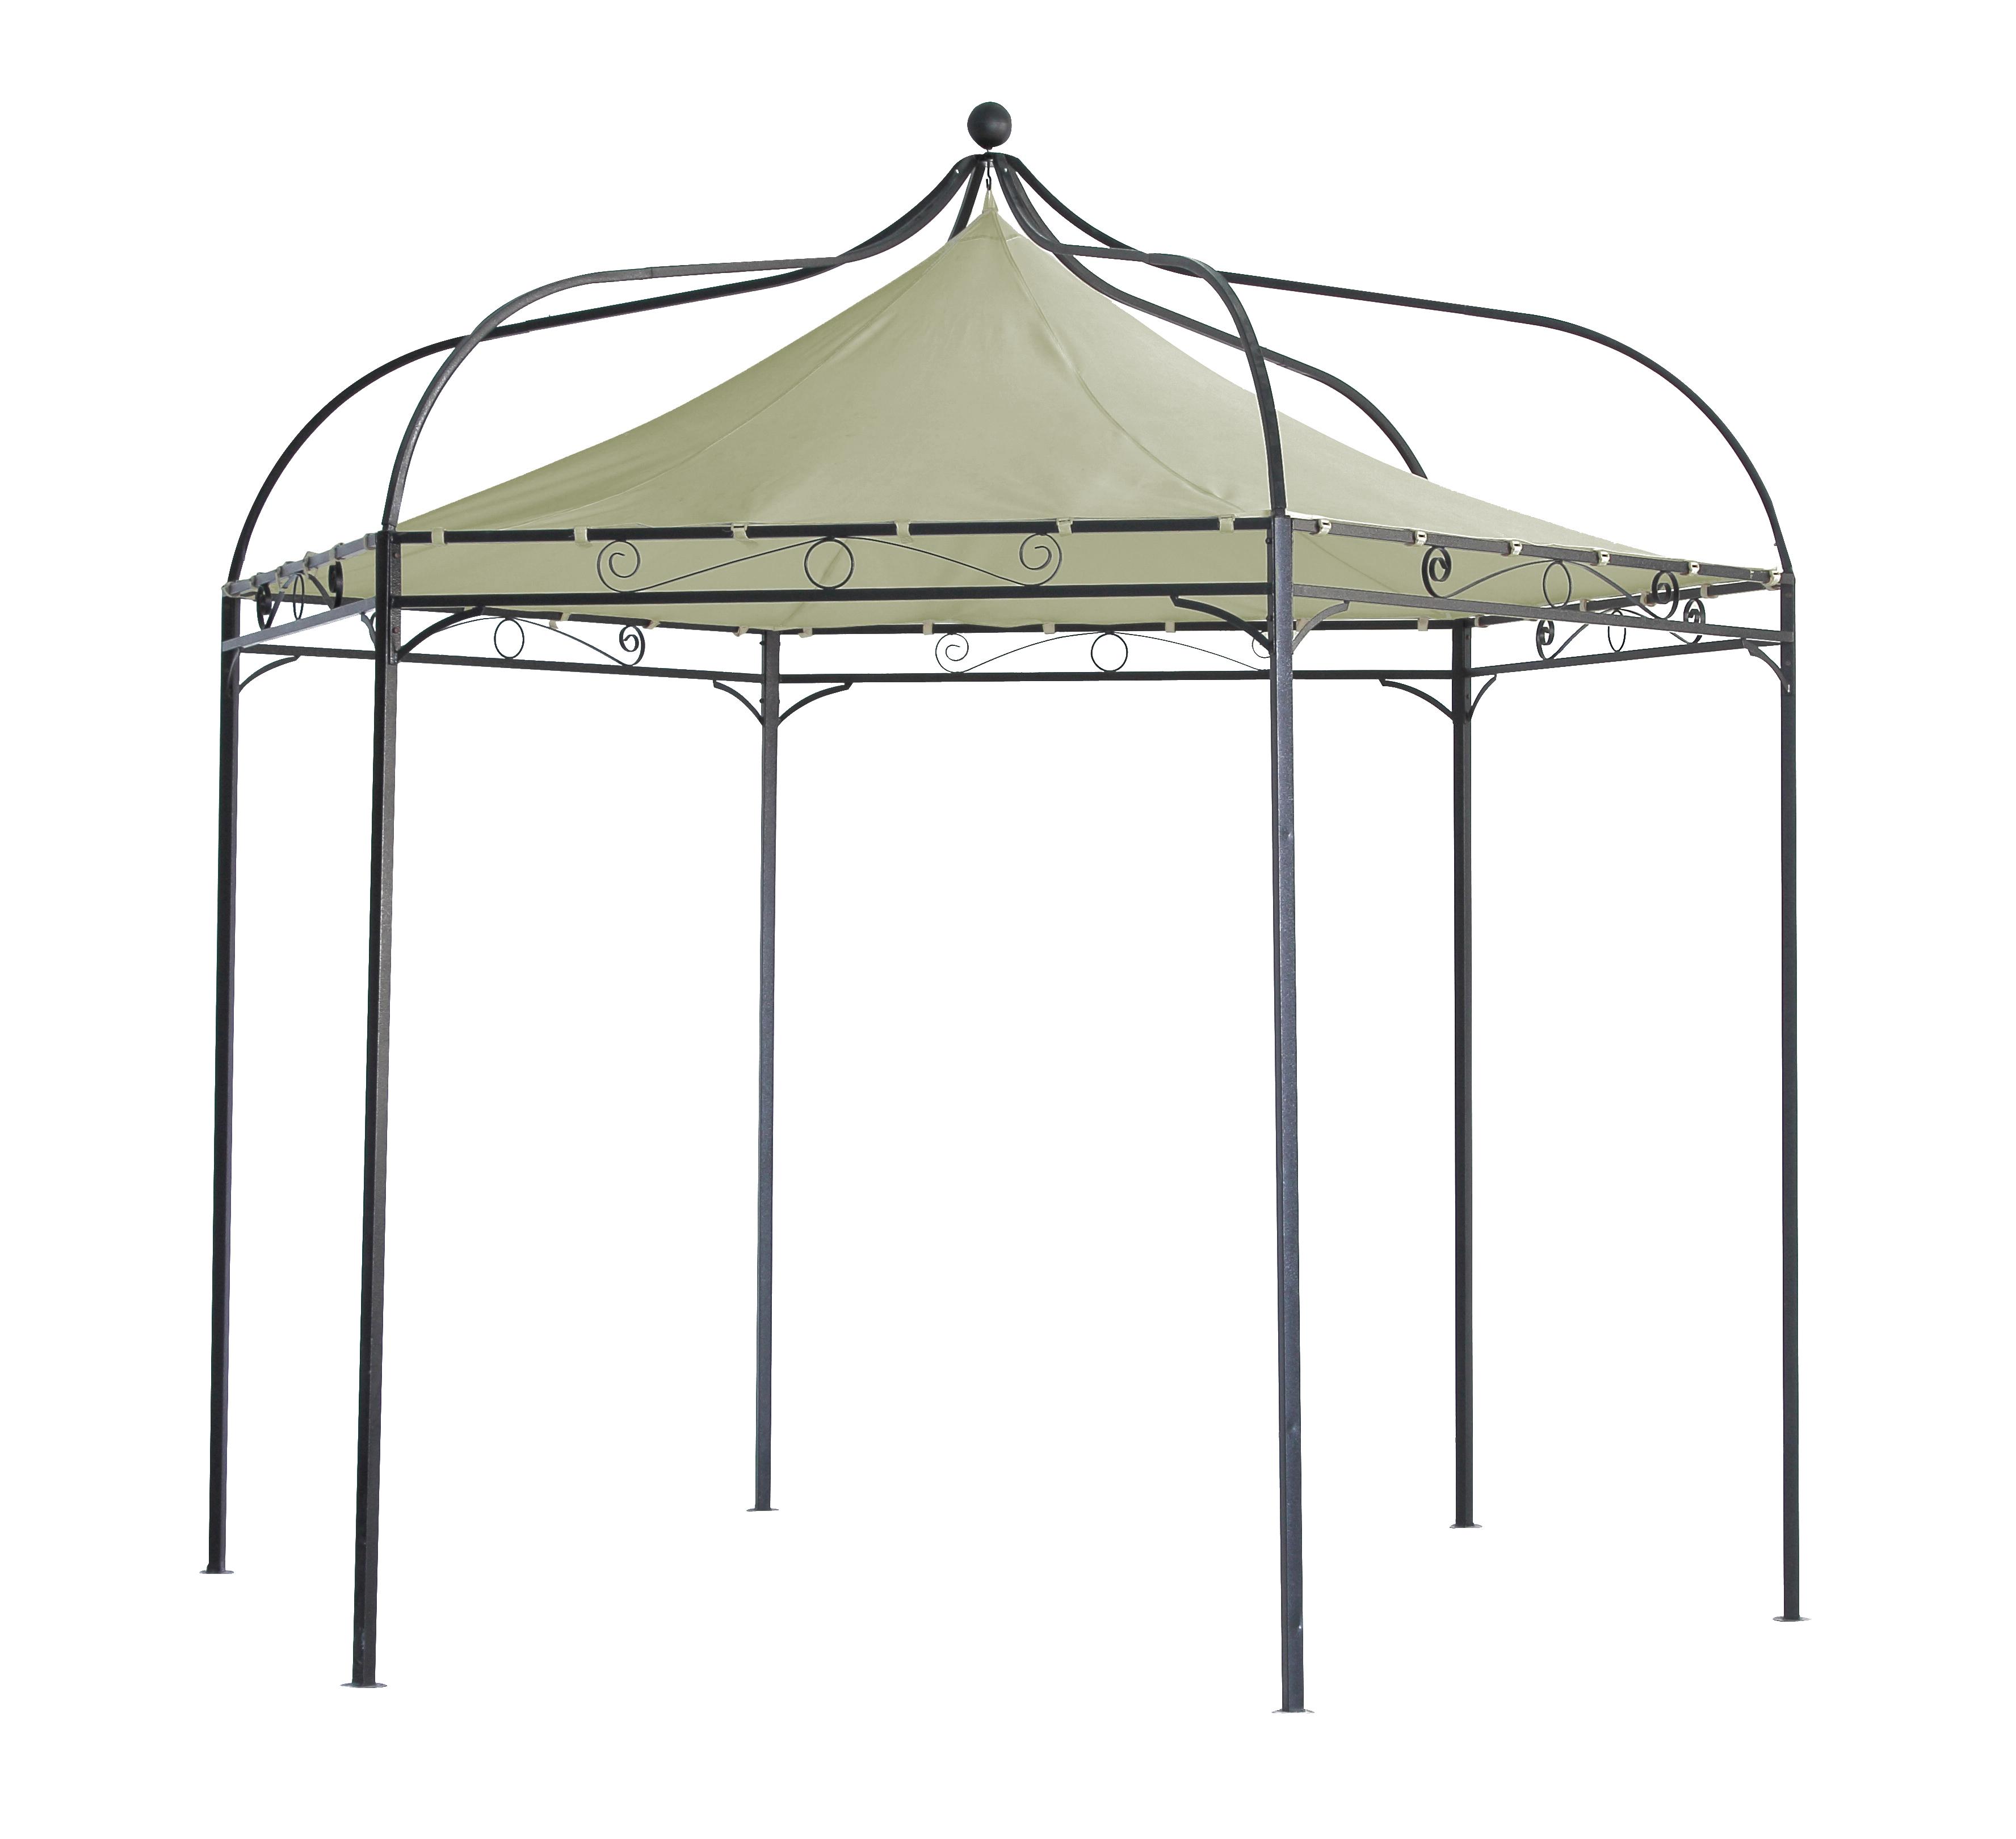 ersatzdach pavillondach dachplane f r pavillon modena 6 eck wasserdicht ecru ebay. Black Bedroom Furniture Sets. Home Design Ideas